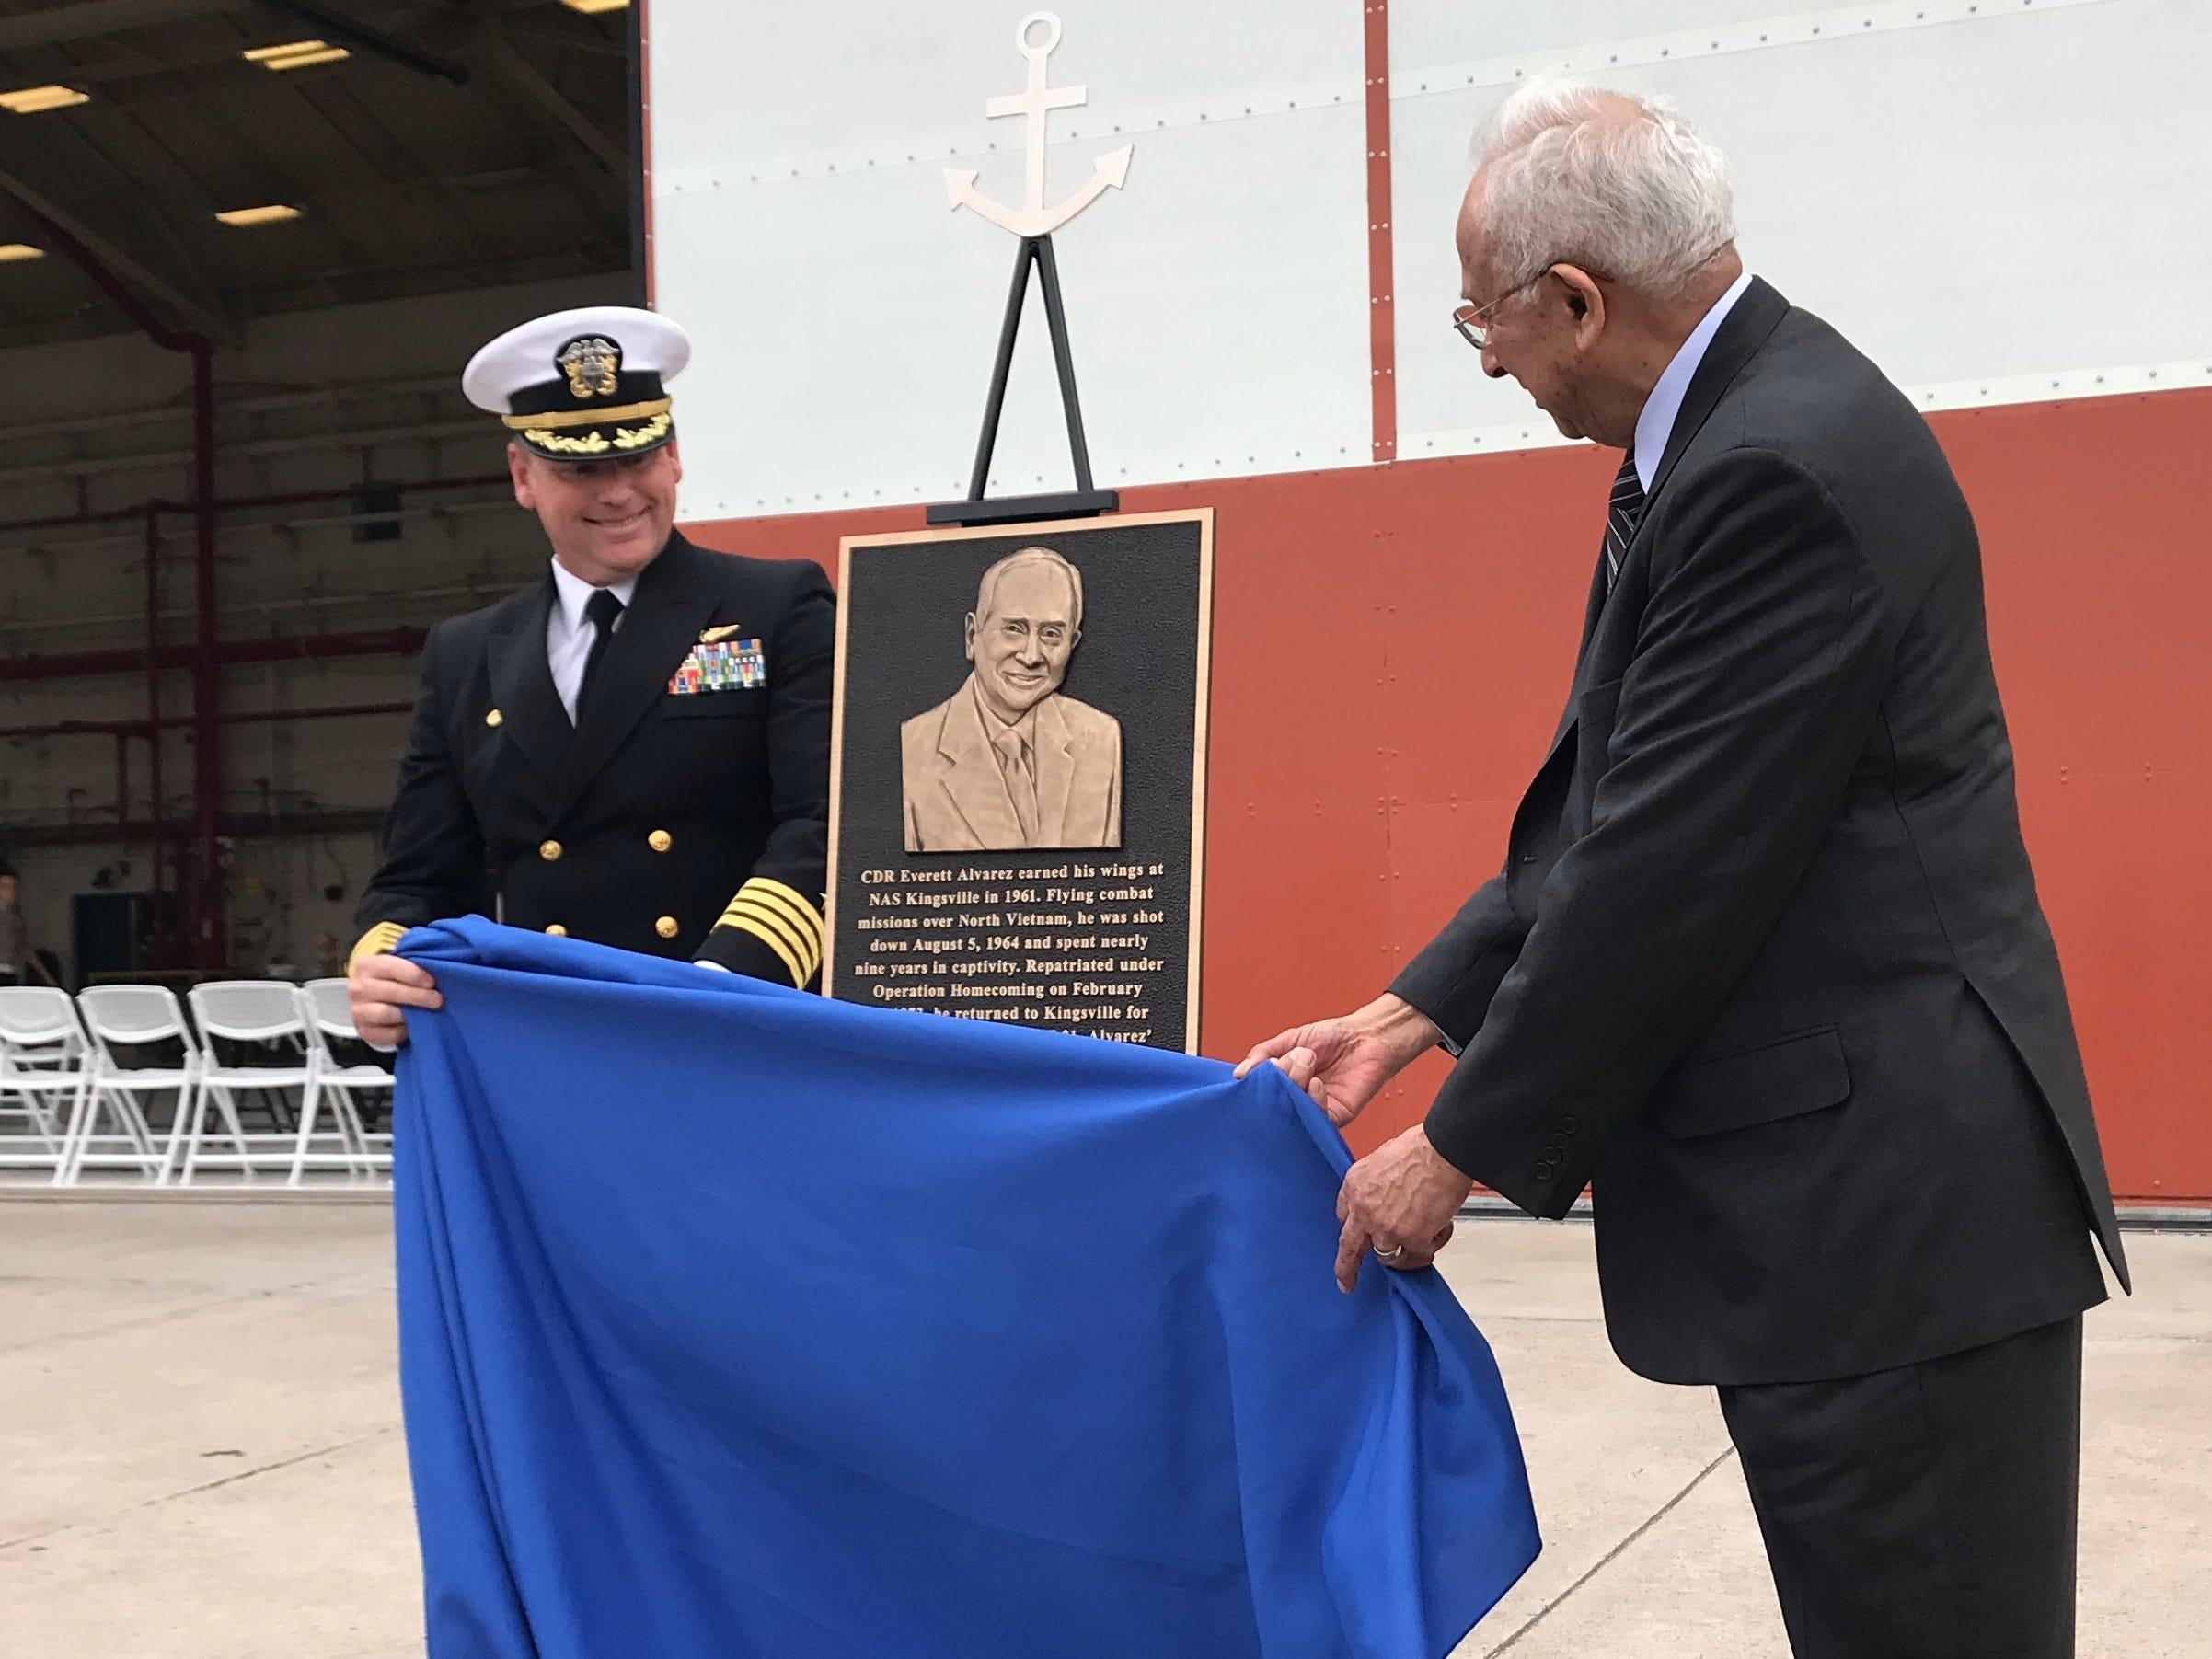 U.S . Navy Capt. Erik A. Spitzer, Commanding Officer of Naval Air Station Kingsville, (left) and retired Commander Everett Alvarez Jr. reveal a plaque. The plaque designates naming a hangar after Alvarez on Thursday, March 14, 2019, at Naval Air Station Kingsville.